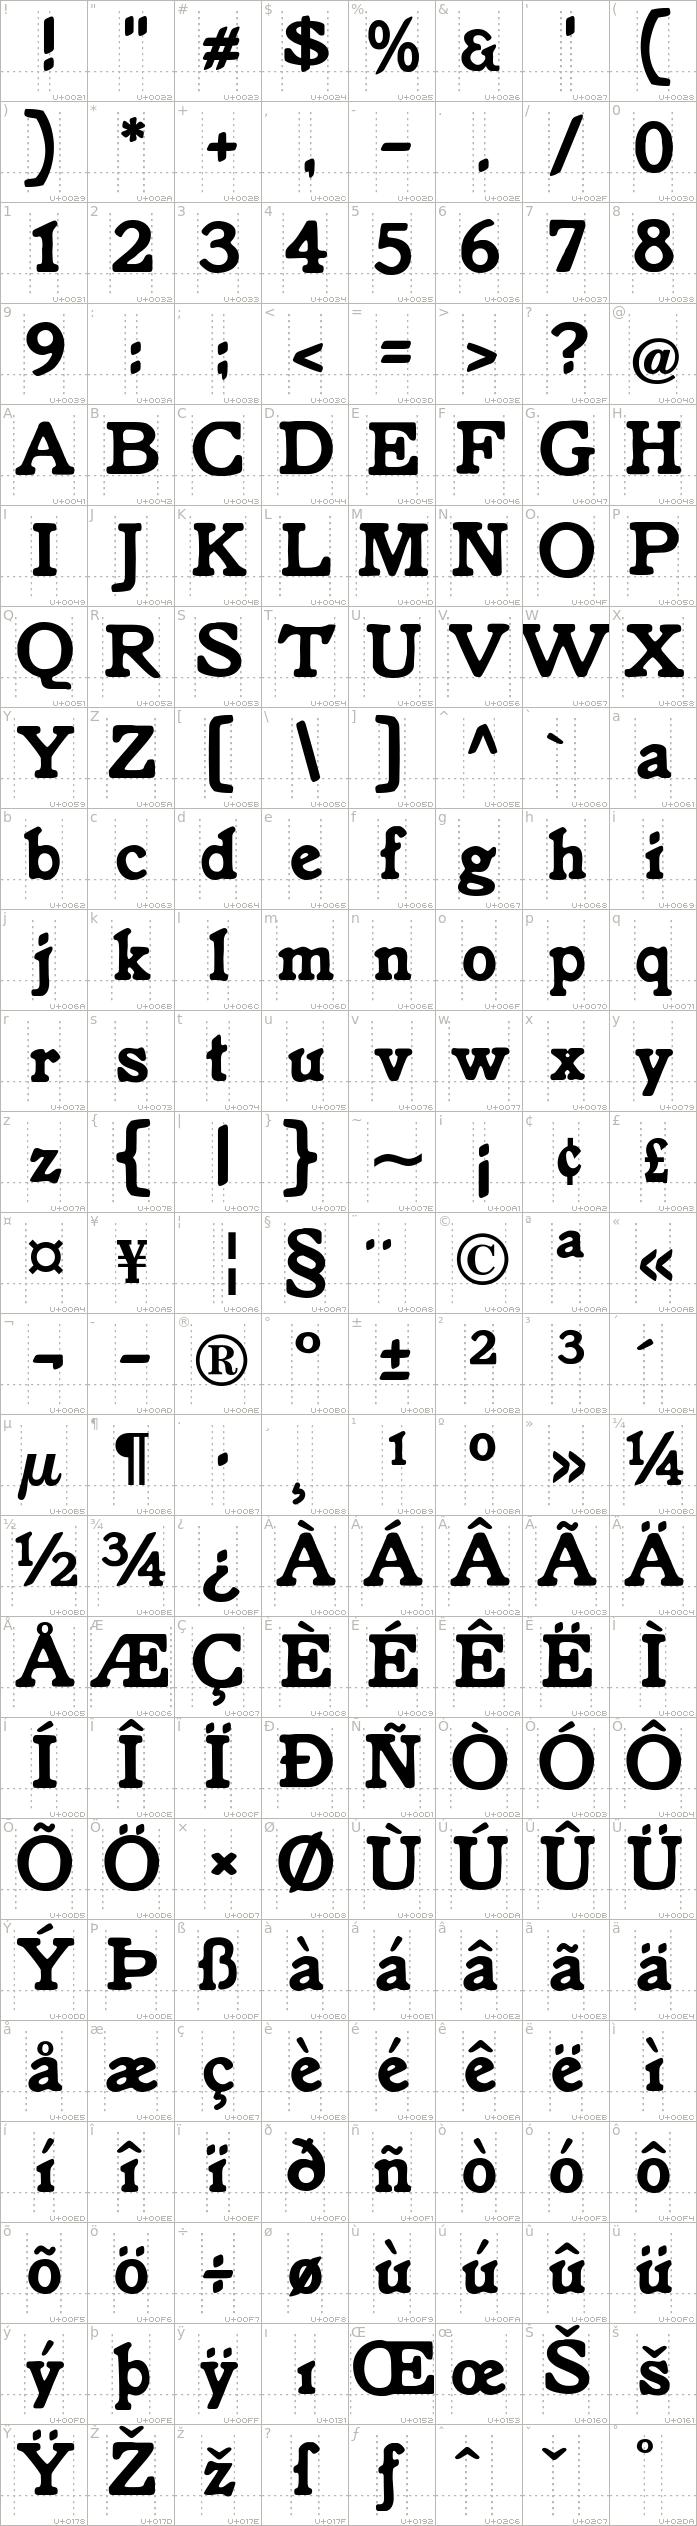 knorke.regular.character-map-1